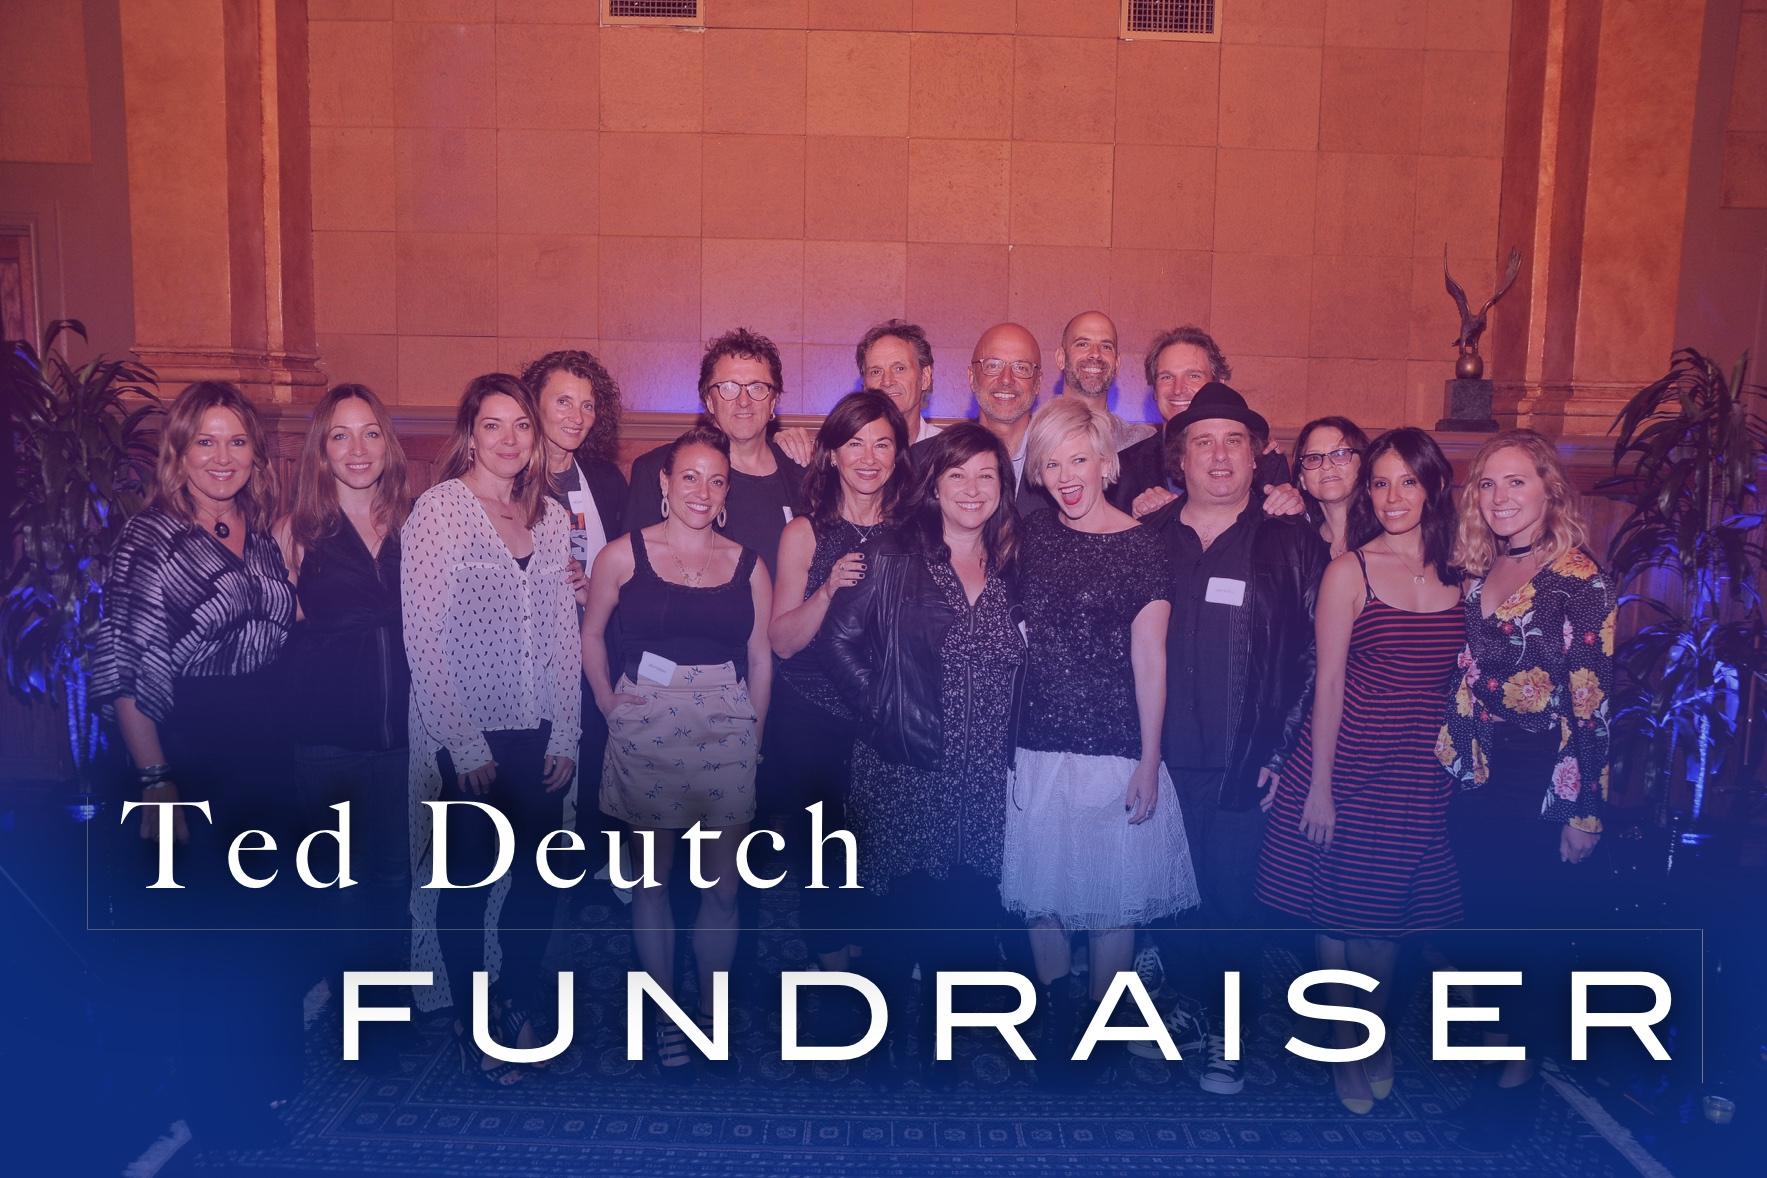 Ted Deutch Fundraiser Banner.jpg